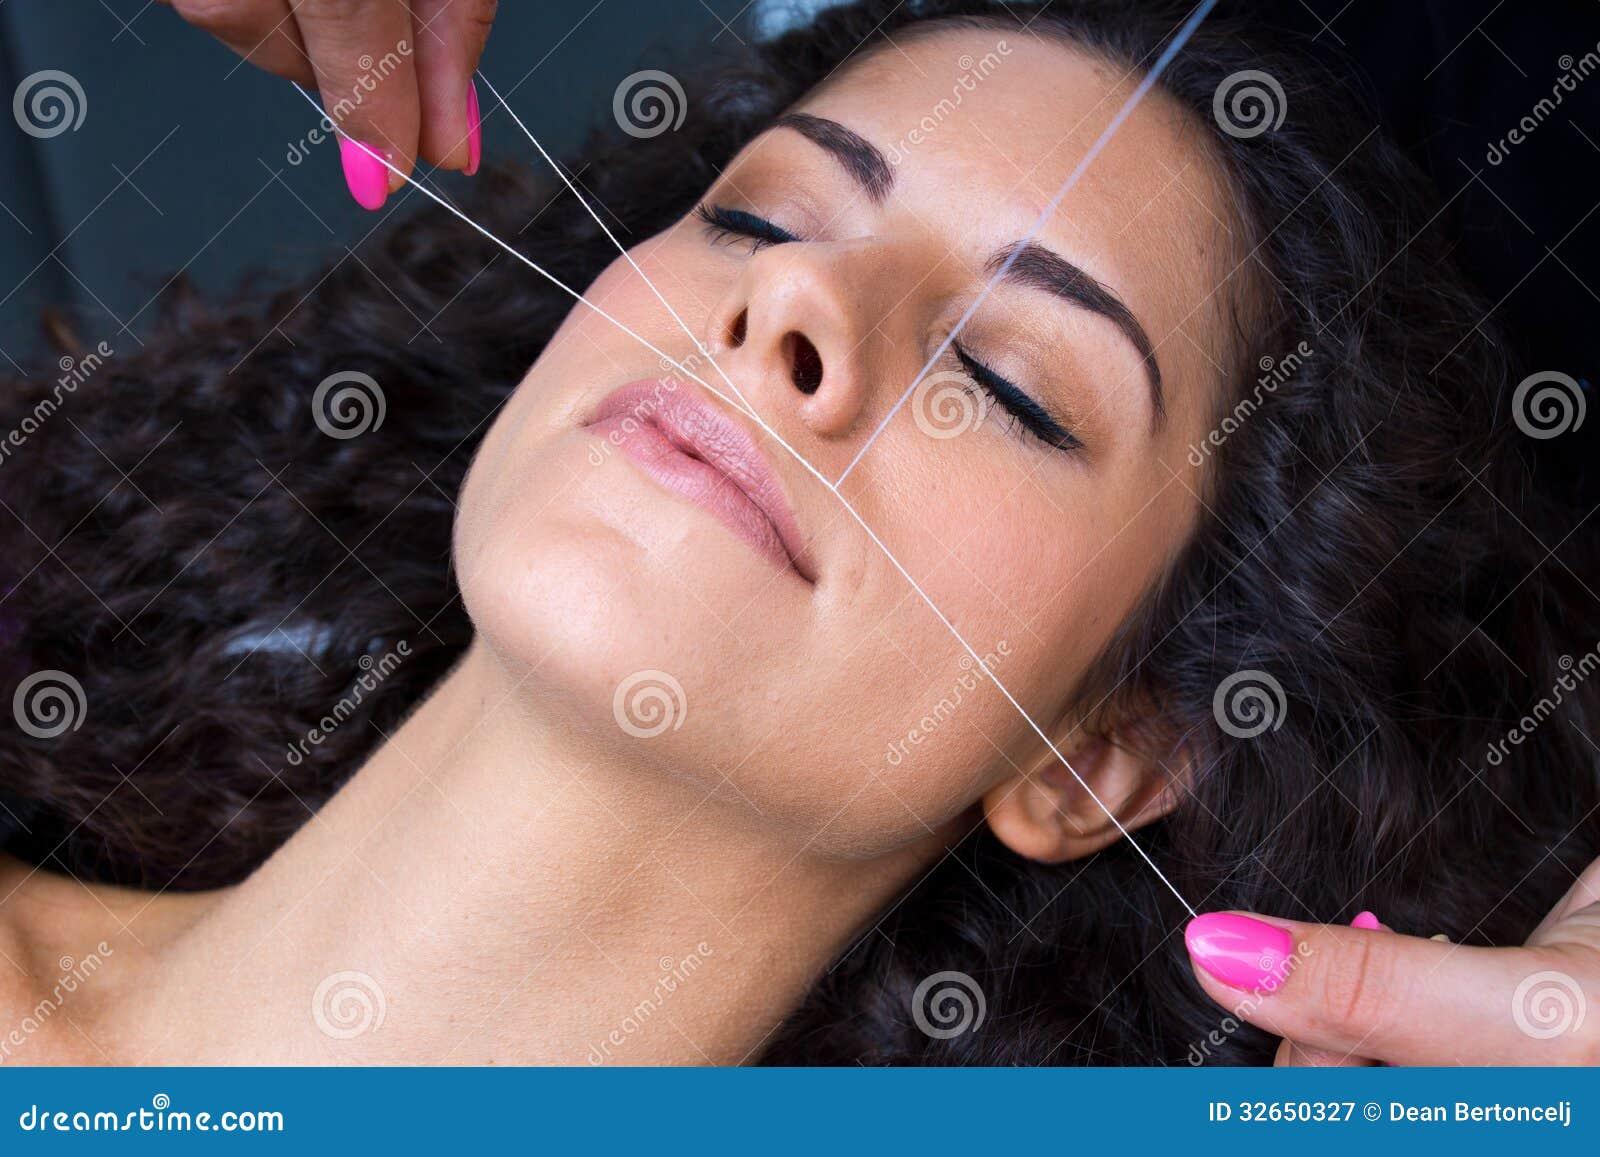 Threading and facial hair